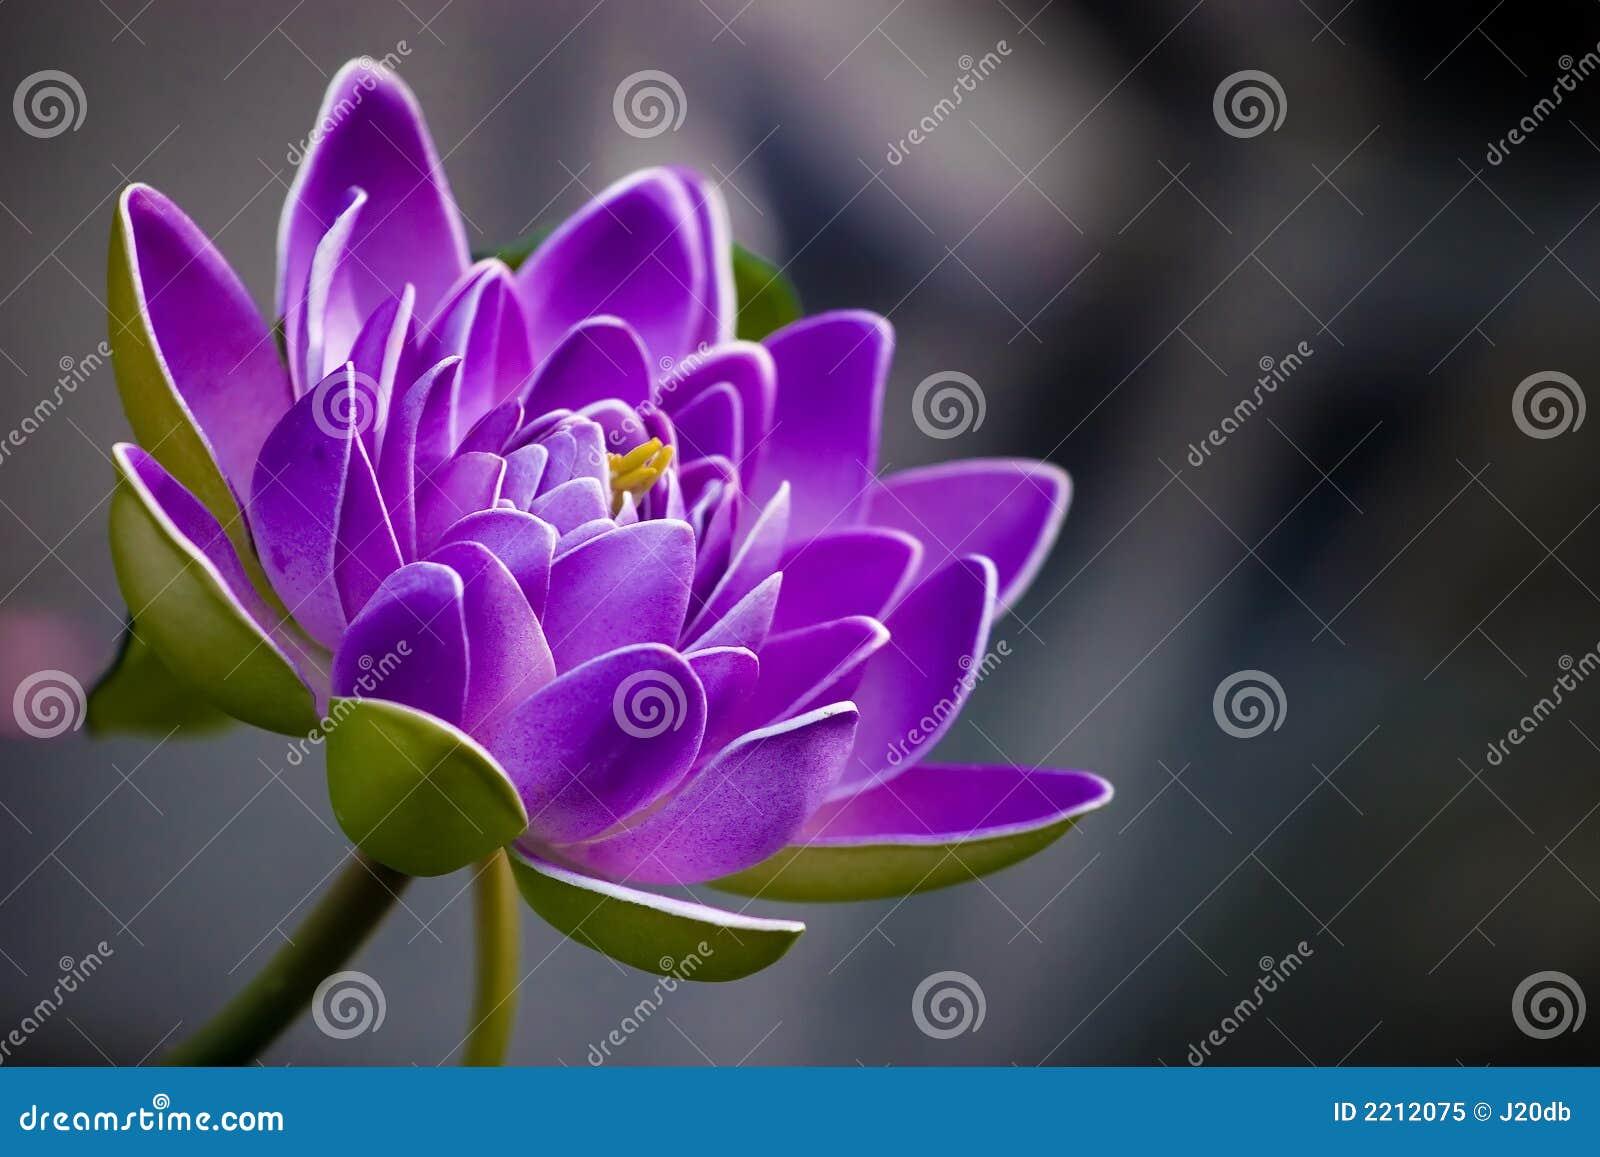 purple flower royalty free stock photo  image, Beautiful flower